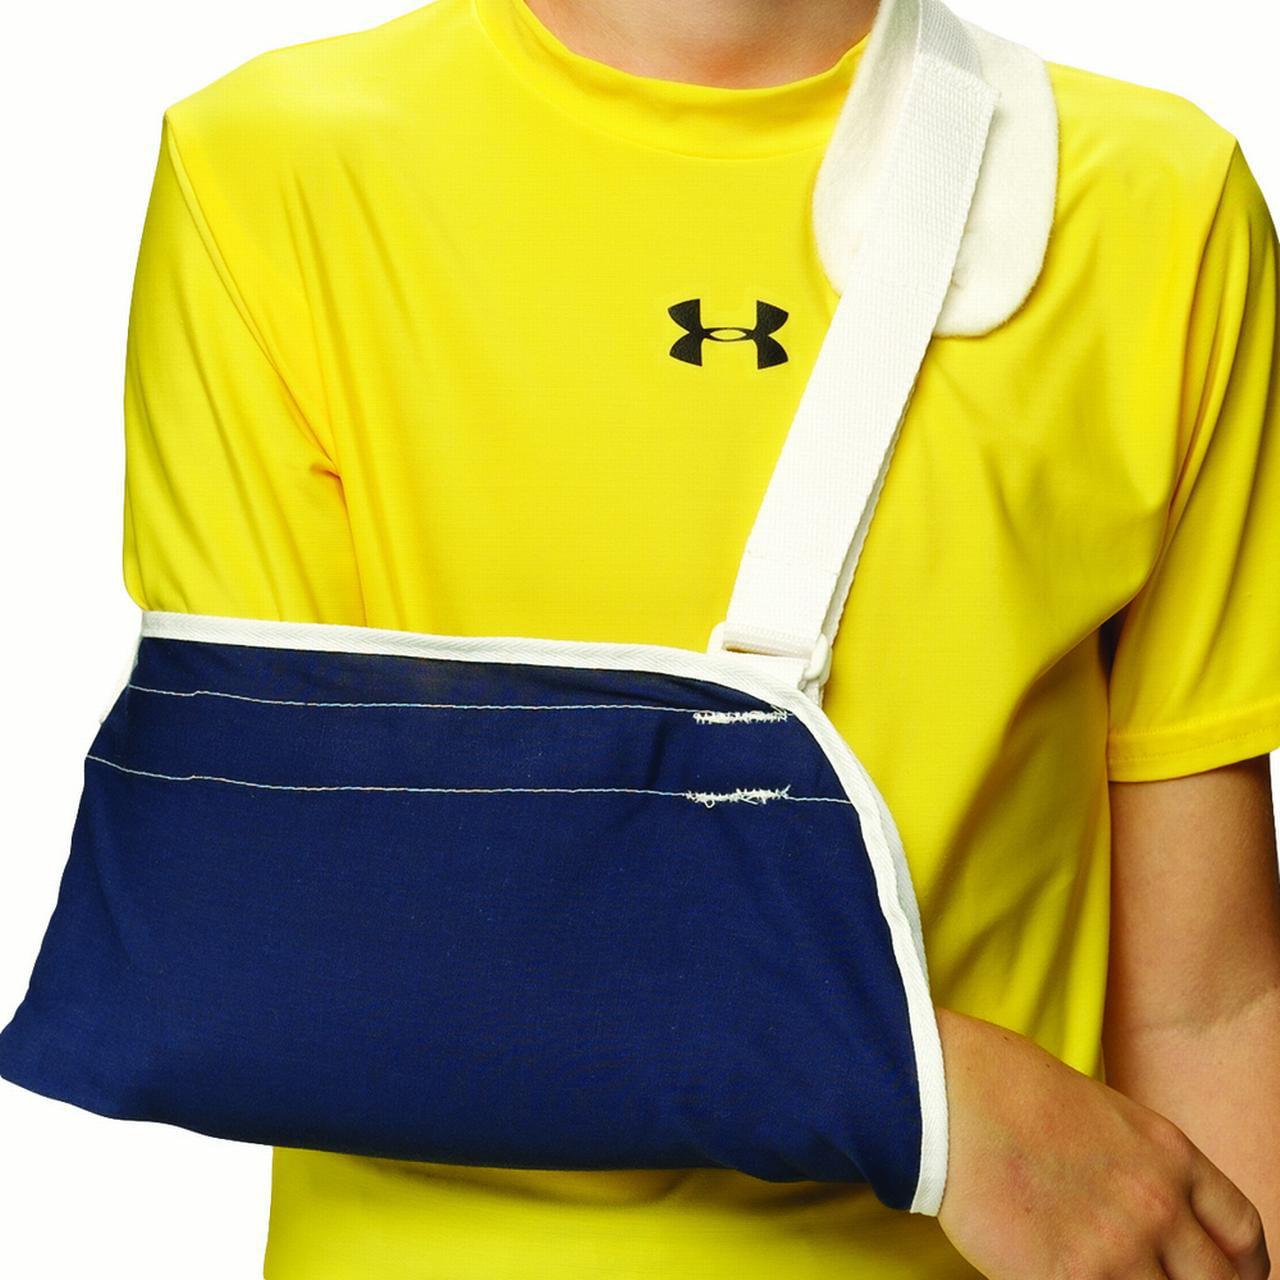 OTC Kidsline Cradle Arm Sling, Navy, Pediatric